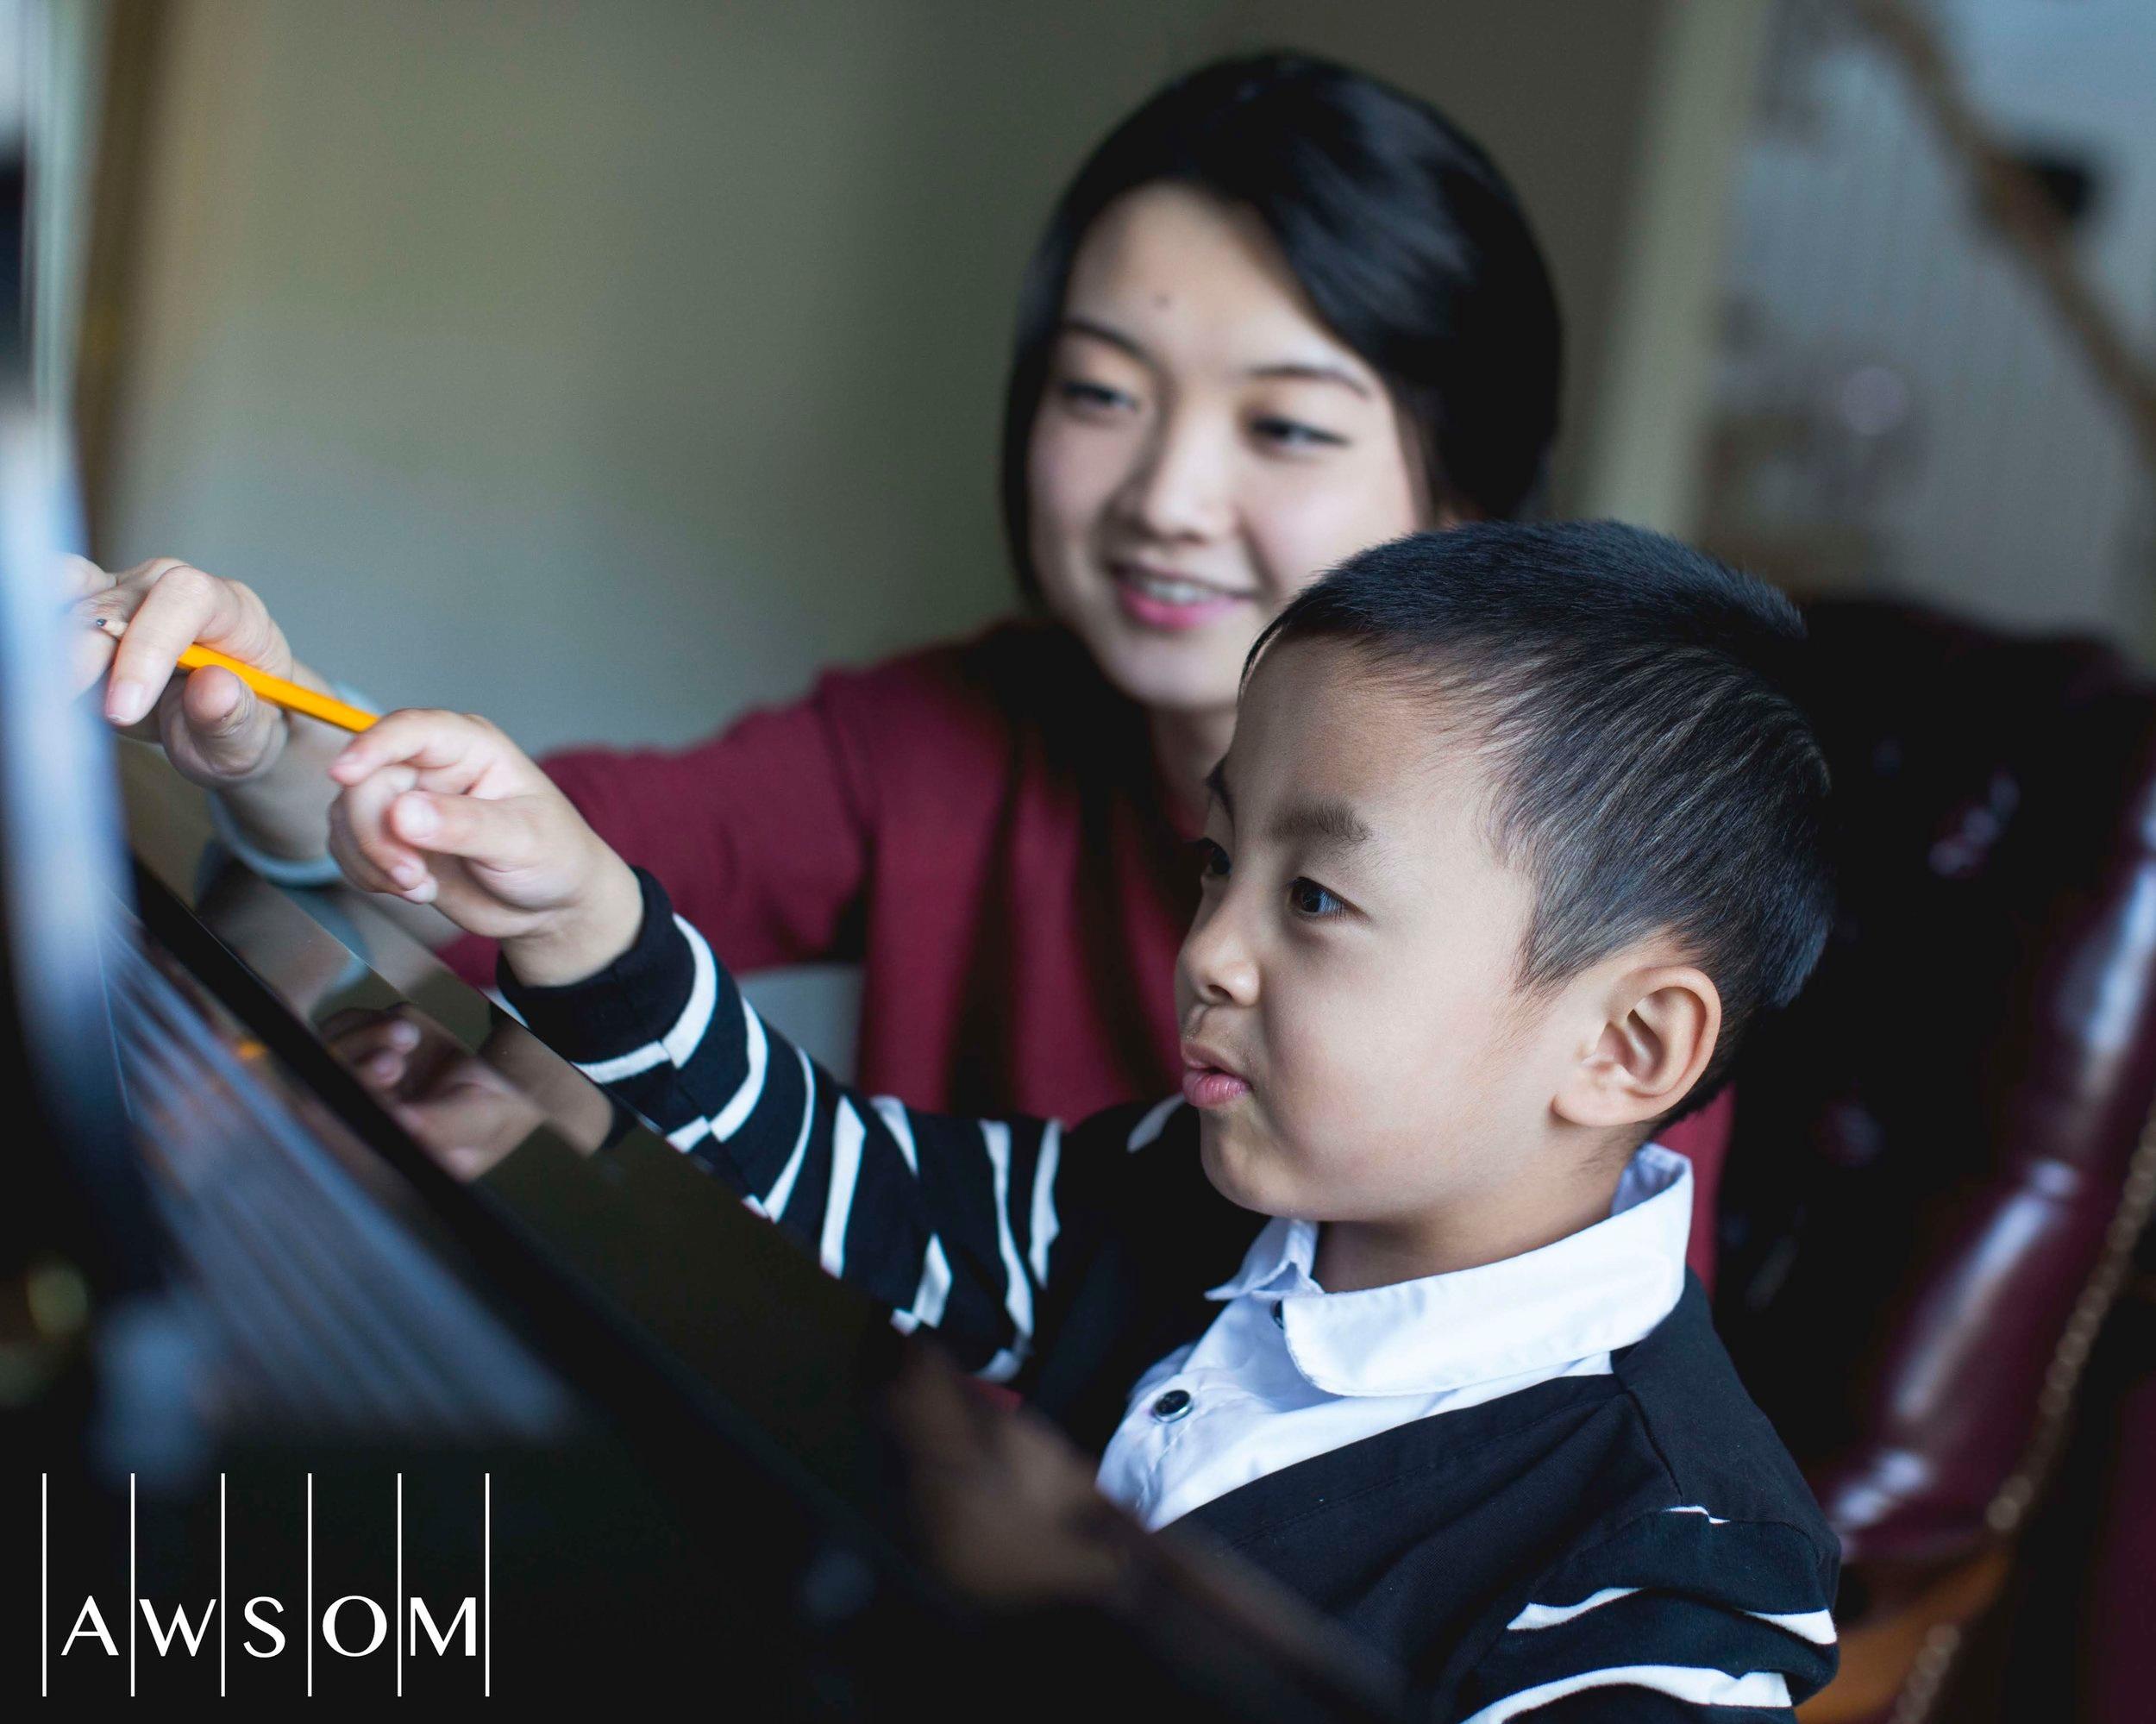 One of our AWSOM music teachers, Yusi Liu